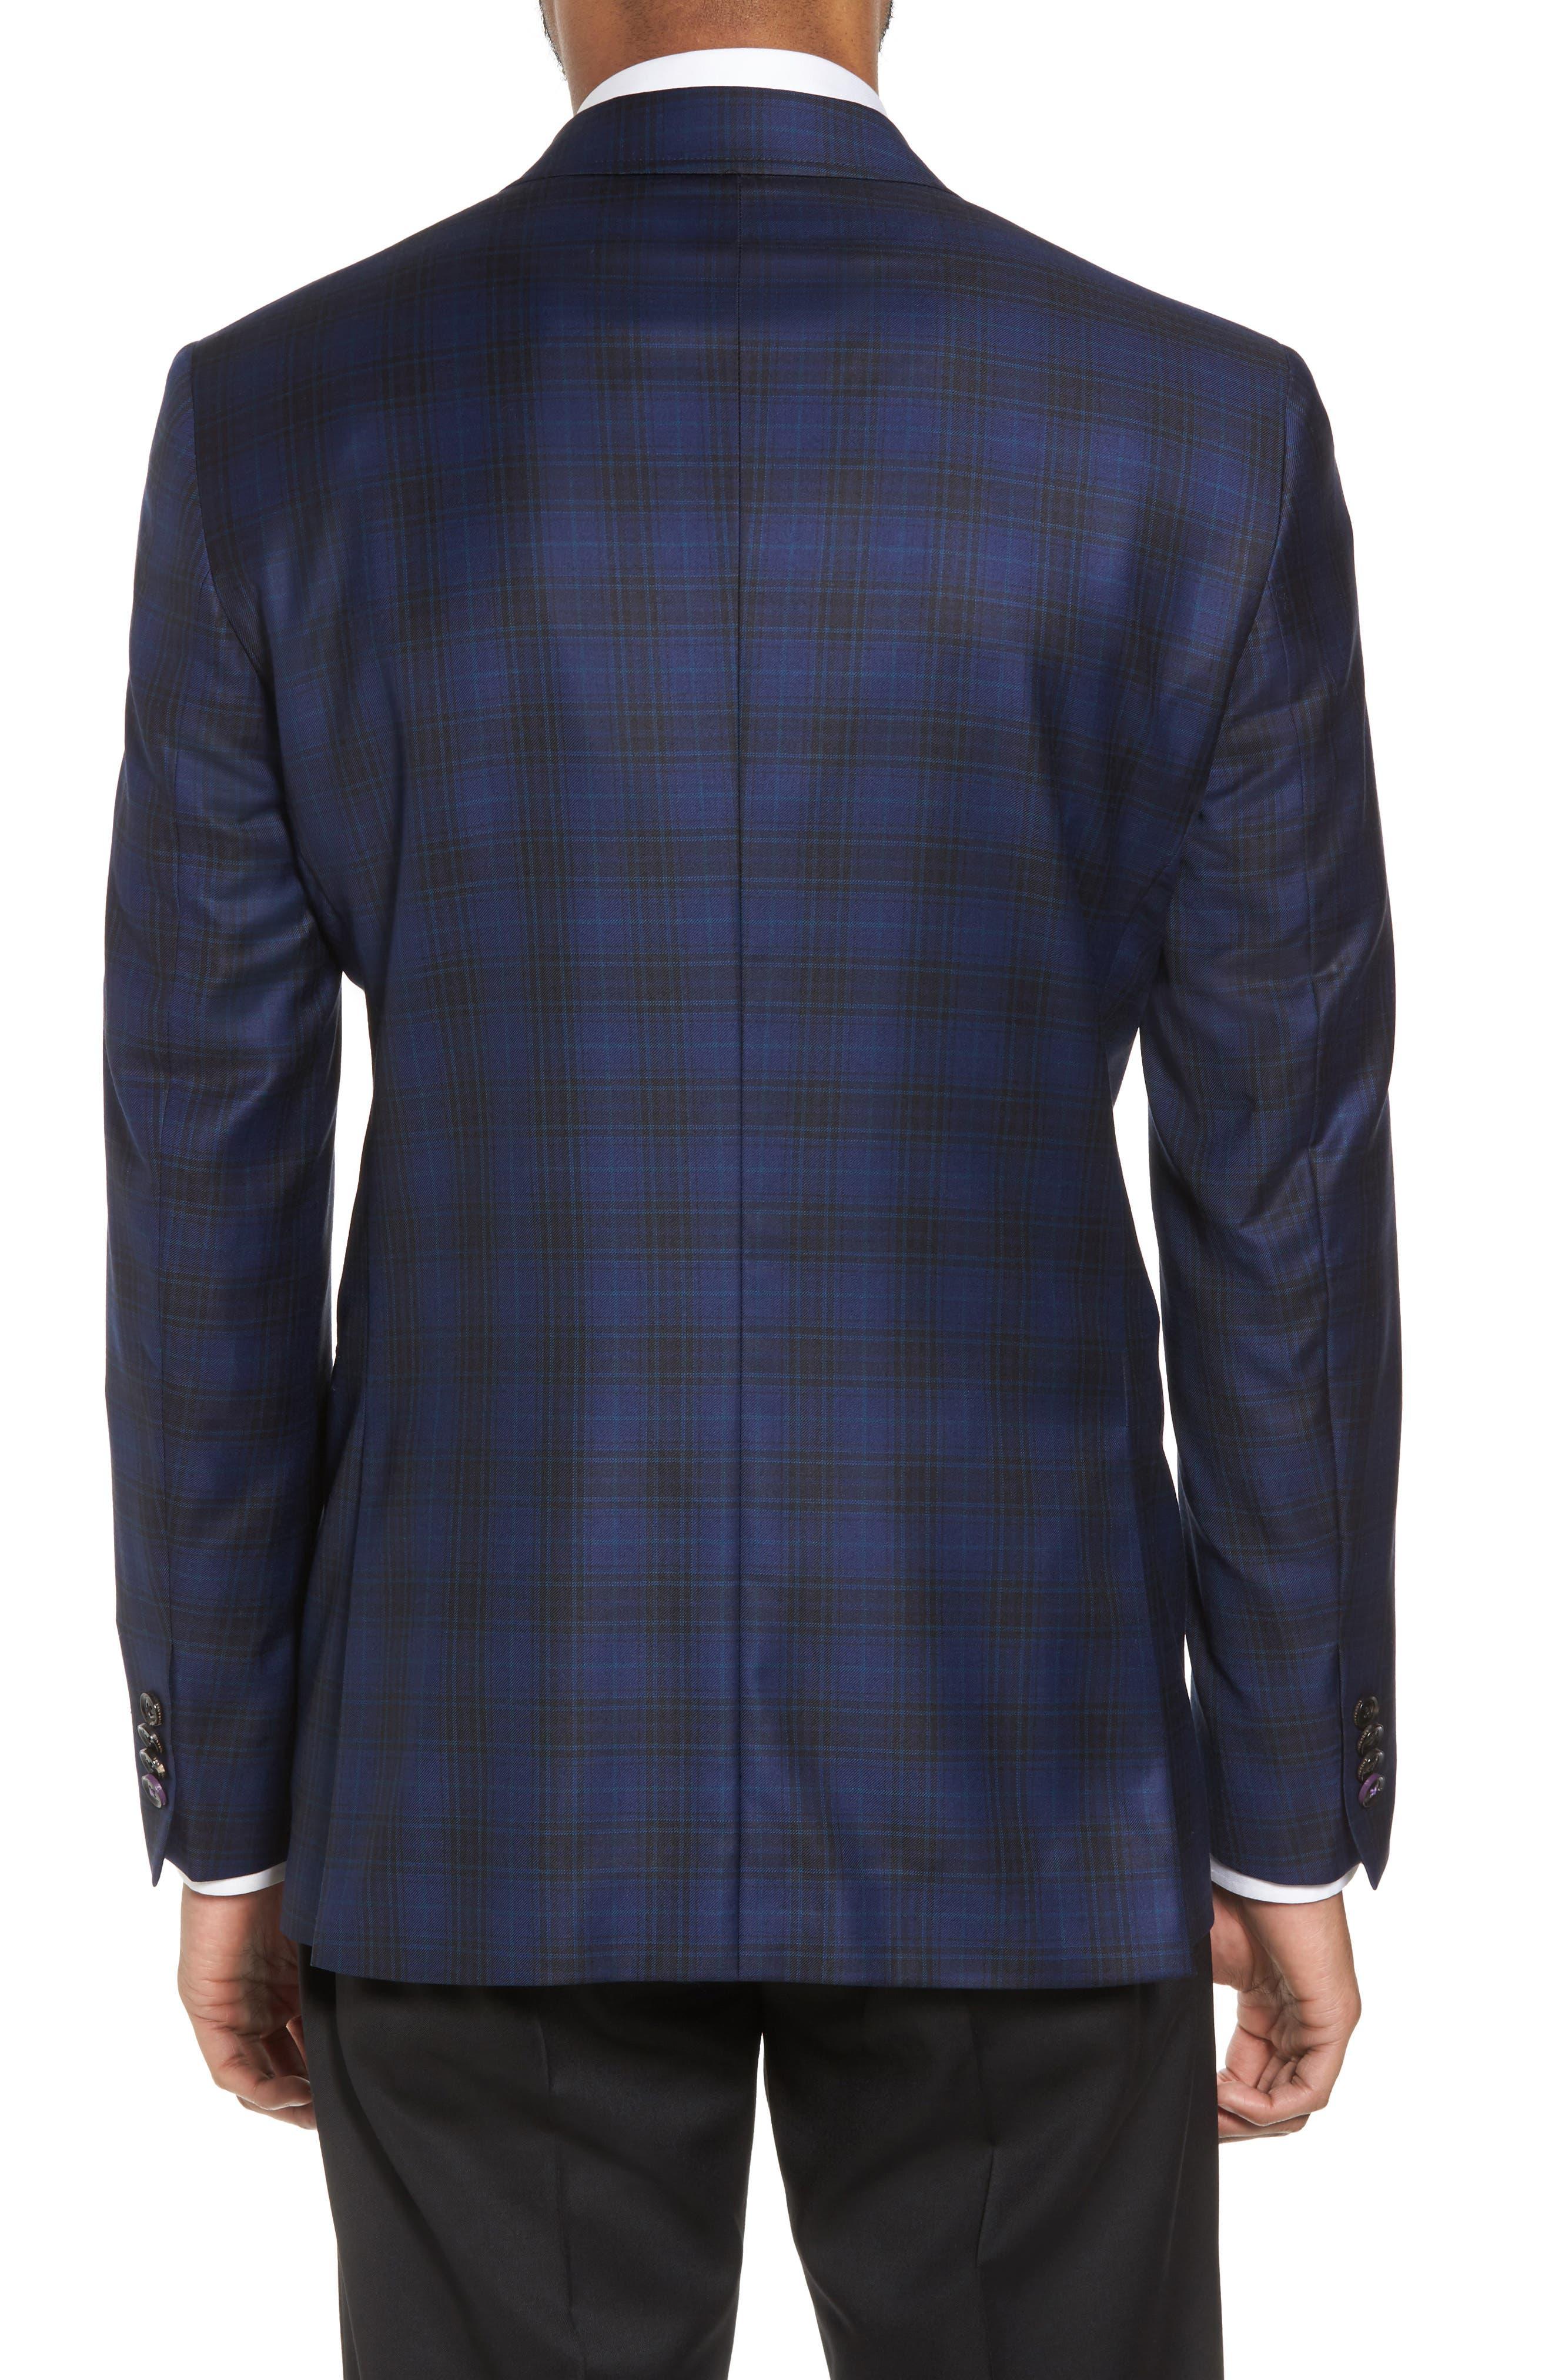 Jay Trim Fit Plaid Wool Sport Coat,                             Alternate thumbnail 2, color,